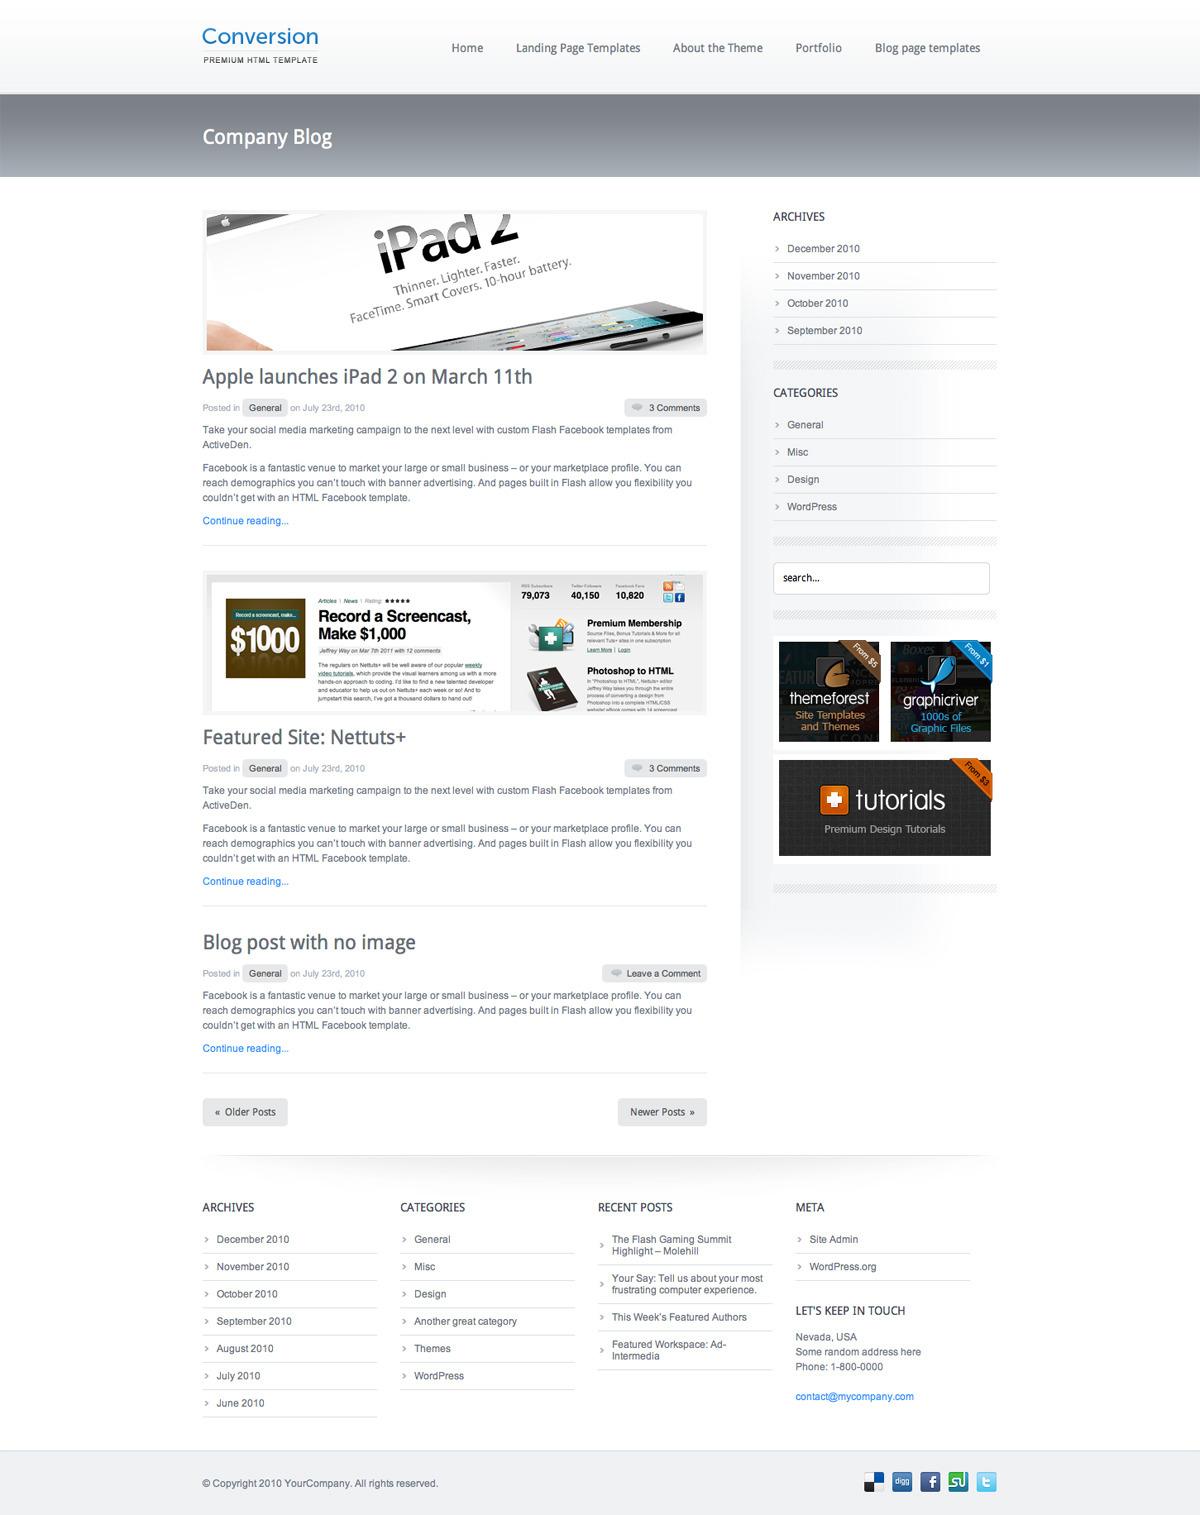 Conversion - Premium HTML Template - Conversion - Premium HTML Template